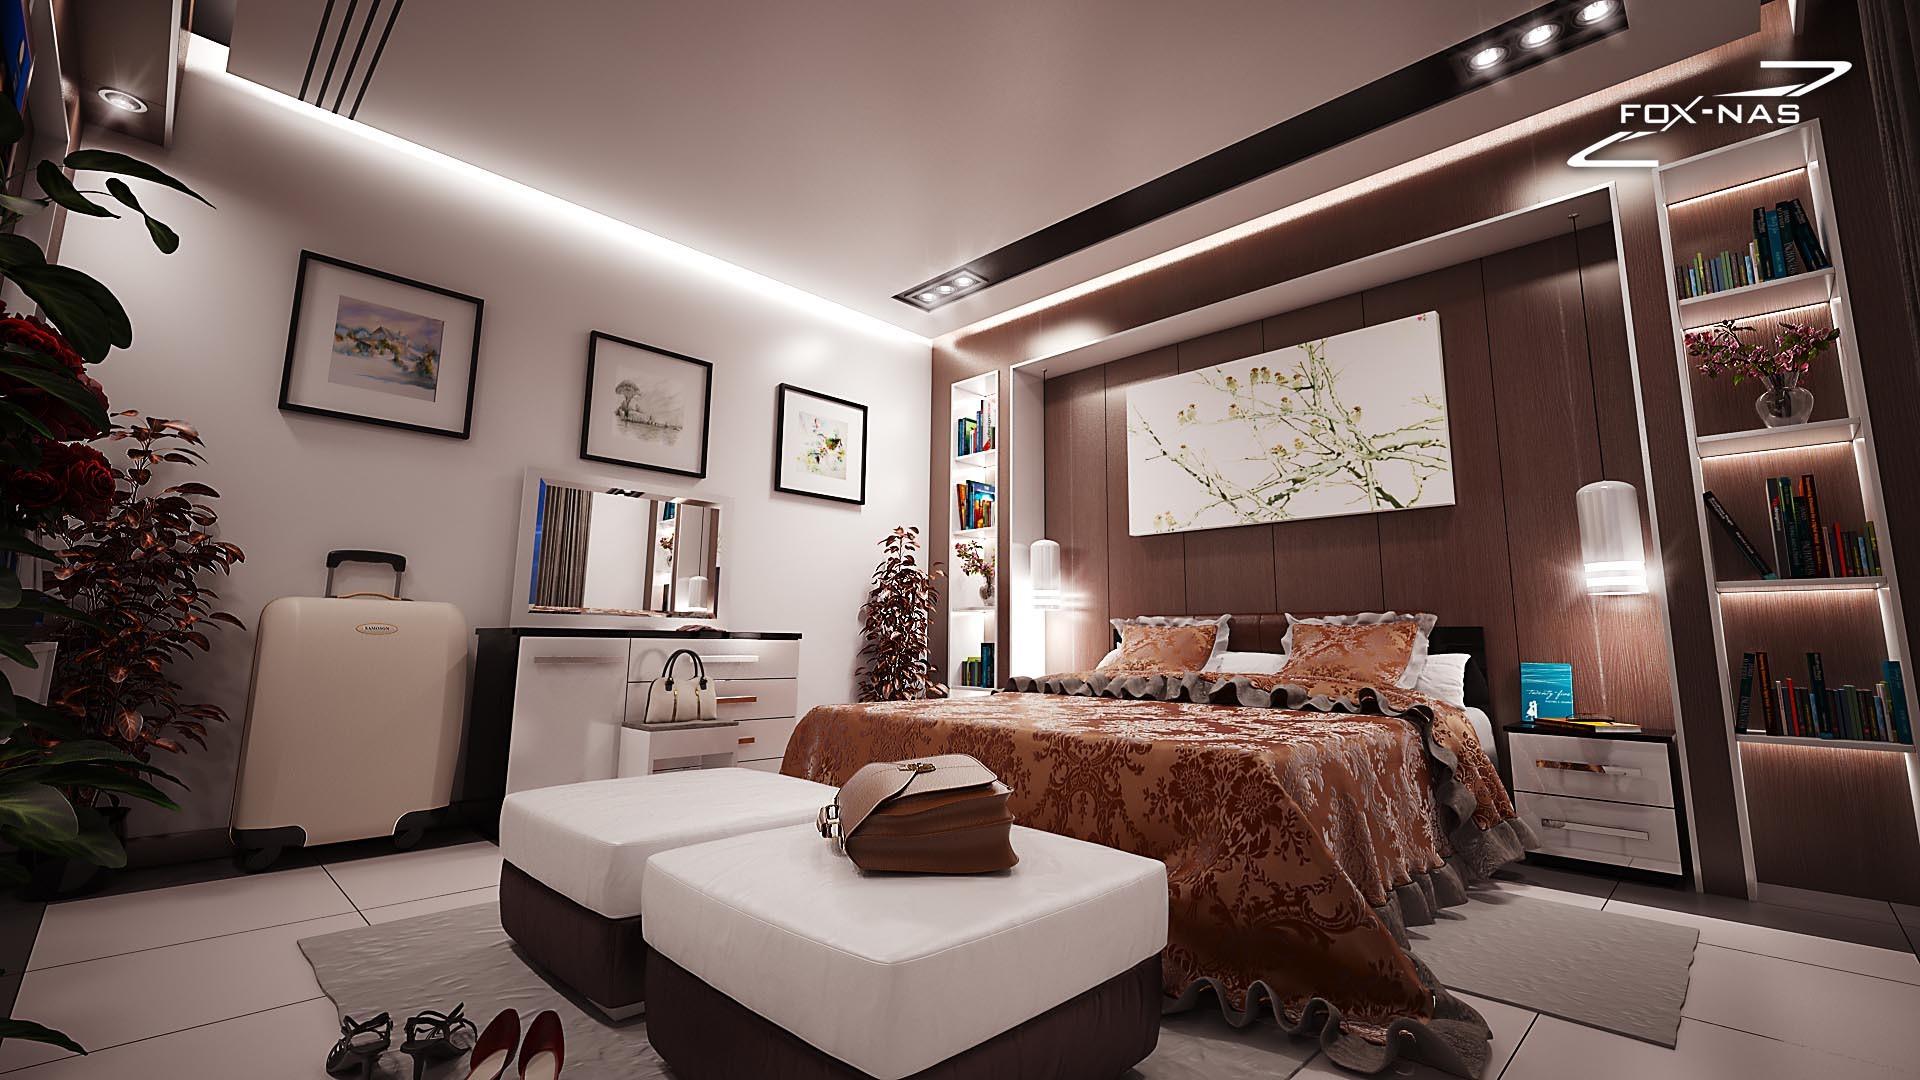 Design chambre luxe parentale, Alger par FOXNAS (www.foxnas.com ...